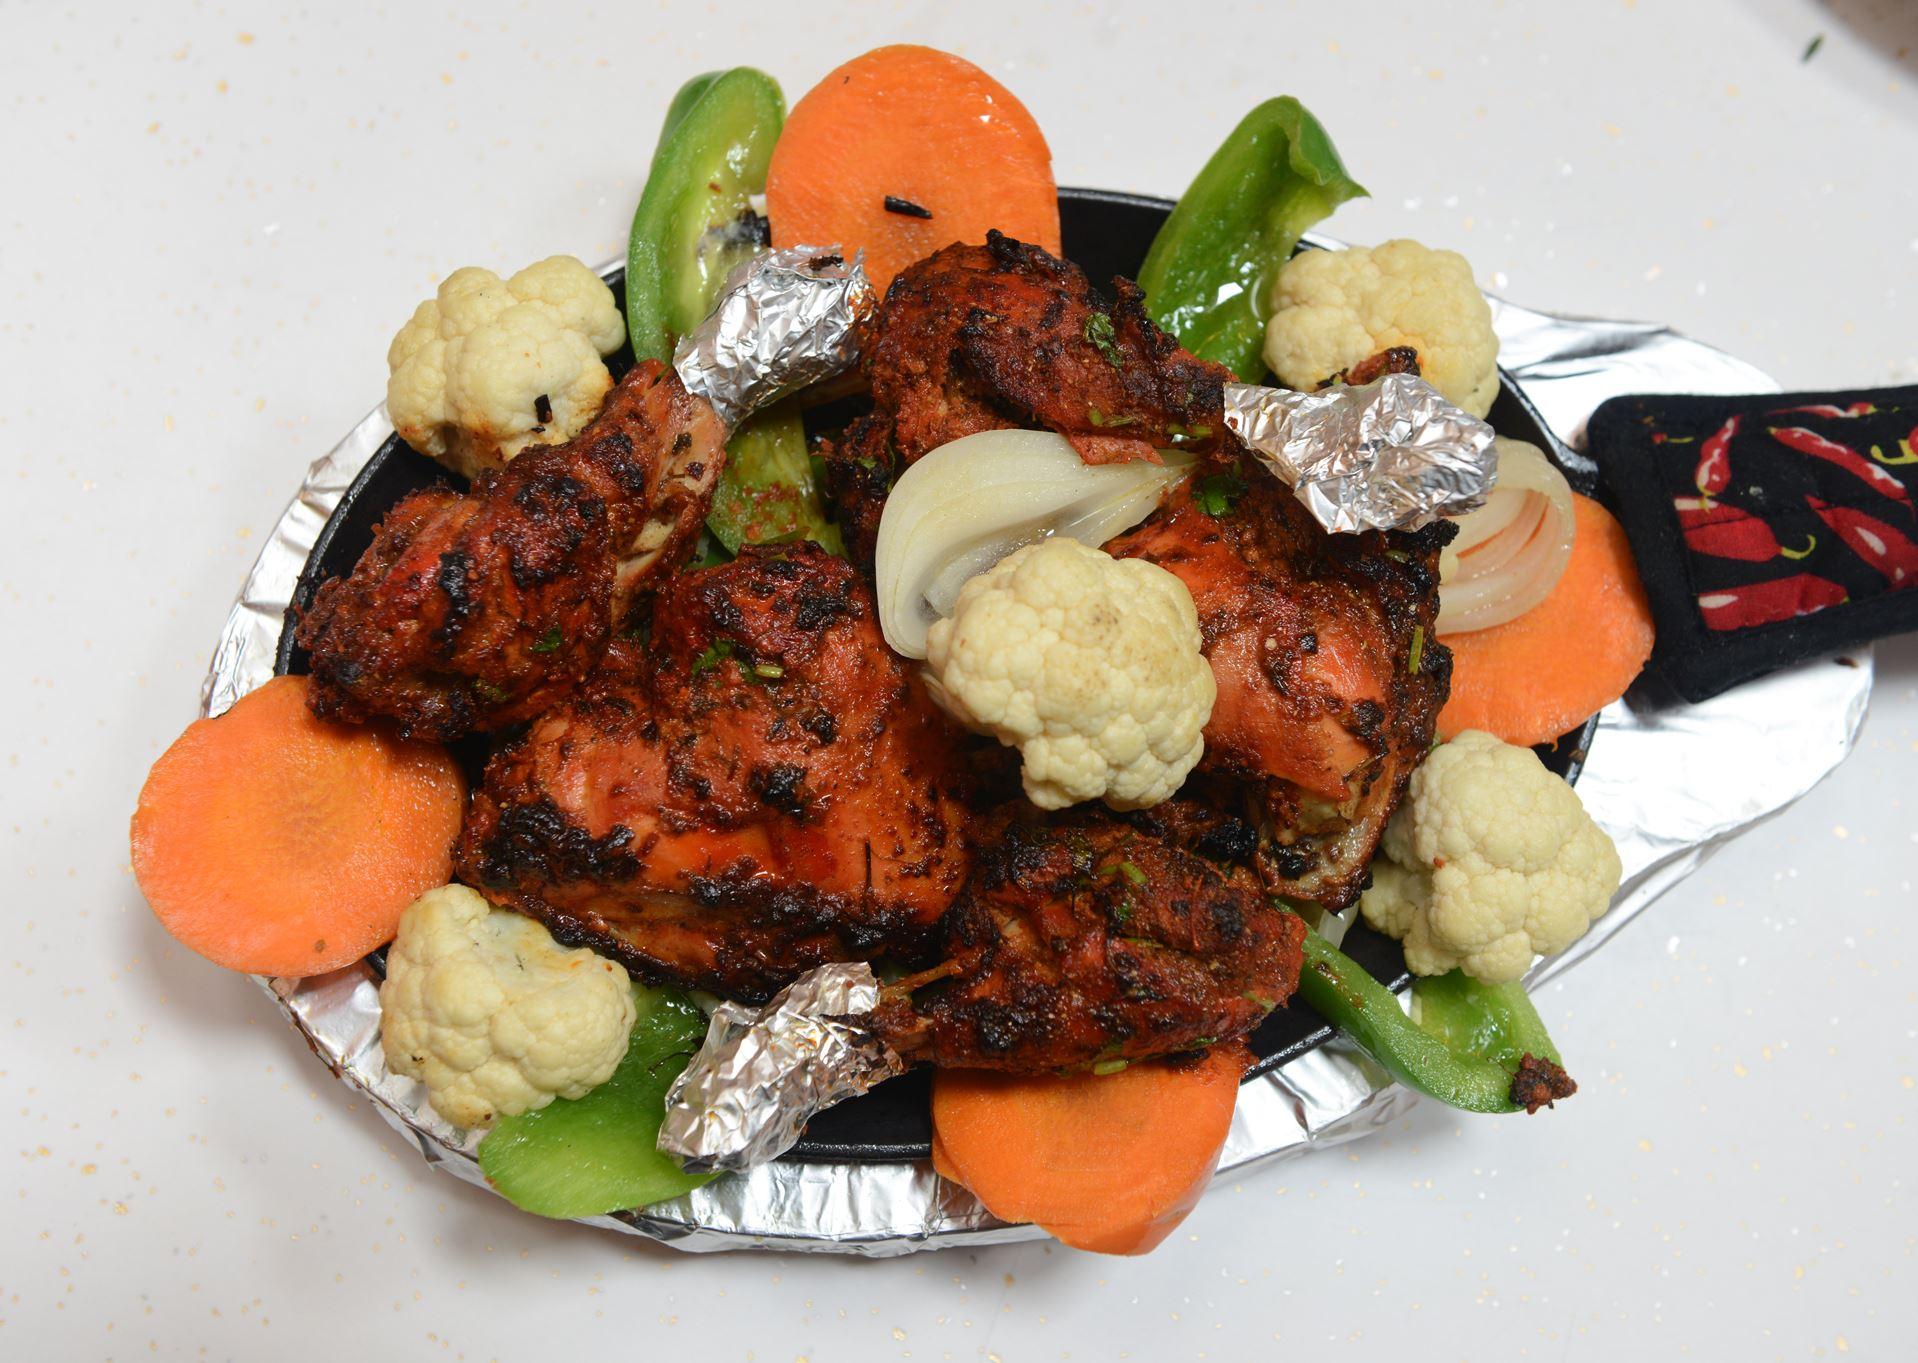 2014520RARmagindian4-3 Tandoori chicken.